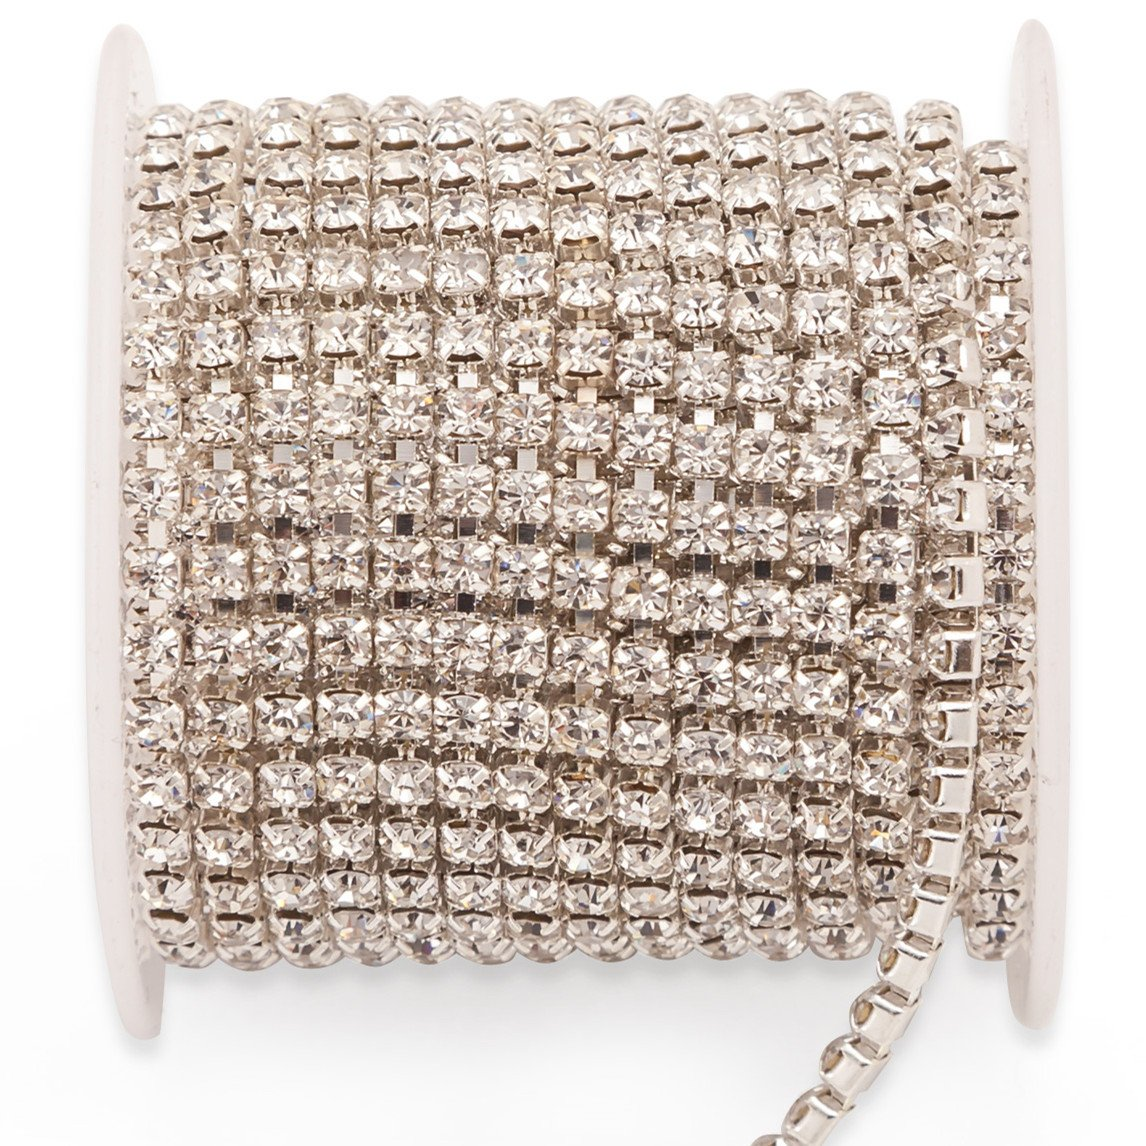 20Yards Crystal Rhinestone Chain, Rhinestone Ribbon Roll for Shoes Jewellery Clothing Crafts, Bridal Bouquet Embellishments, Wedding Dress, Phone Case, Party DIY Decorations 2 Rolls (Colorful Silver) Shallylu 4337027836